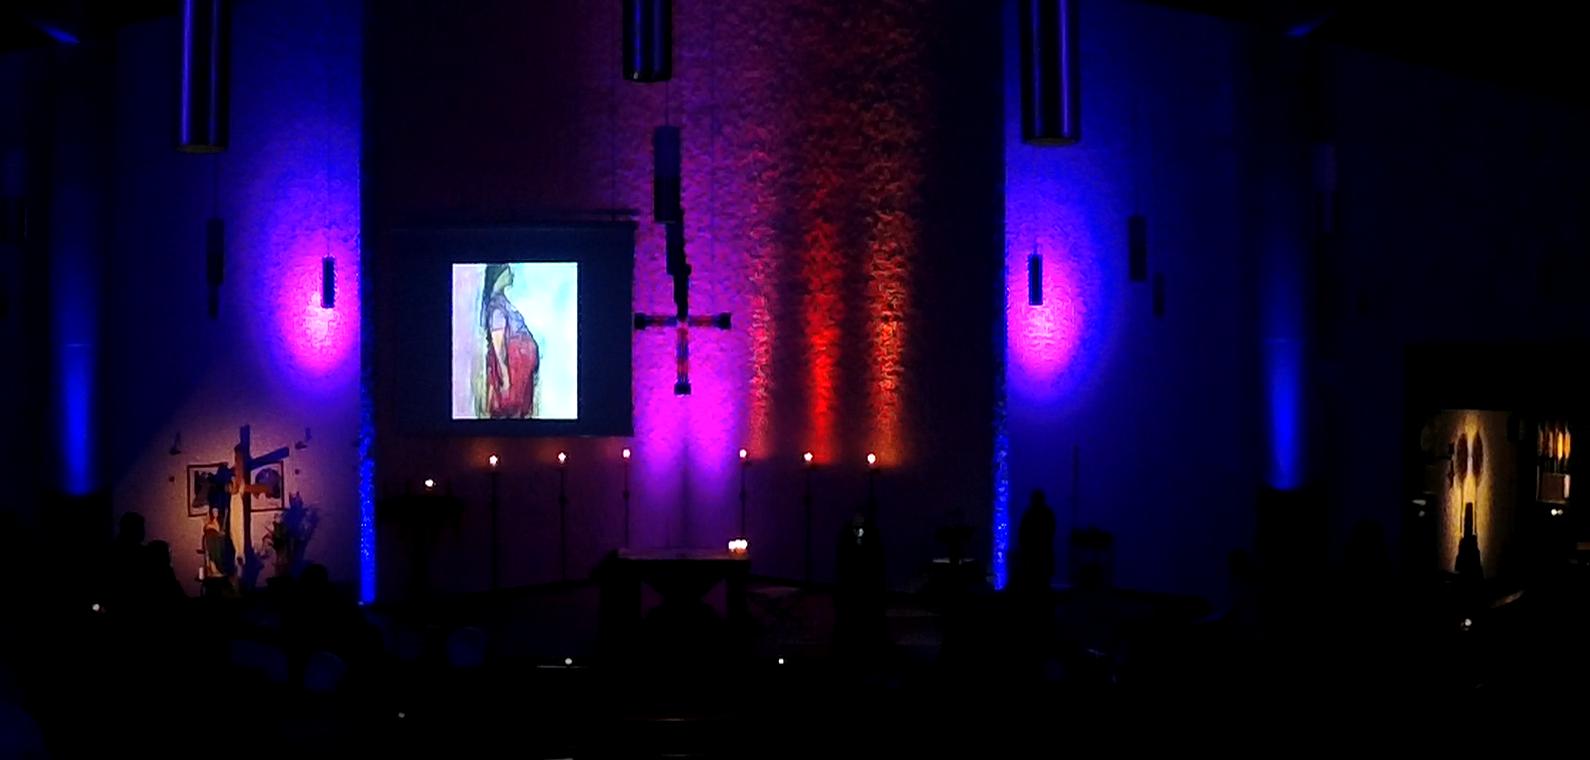 Dunkle Kirche farblich illuminiert